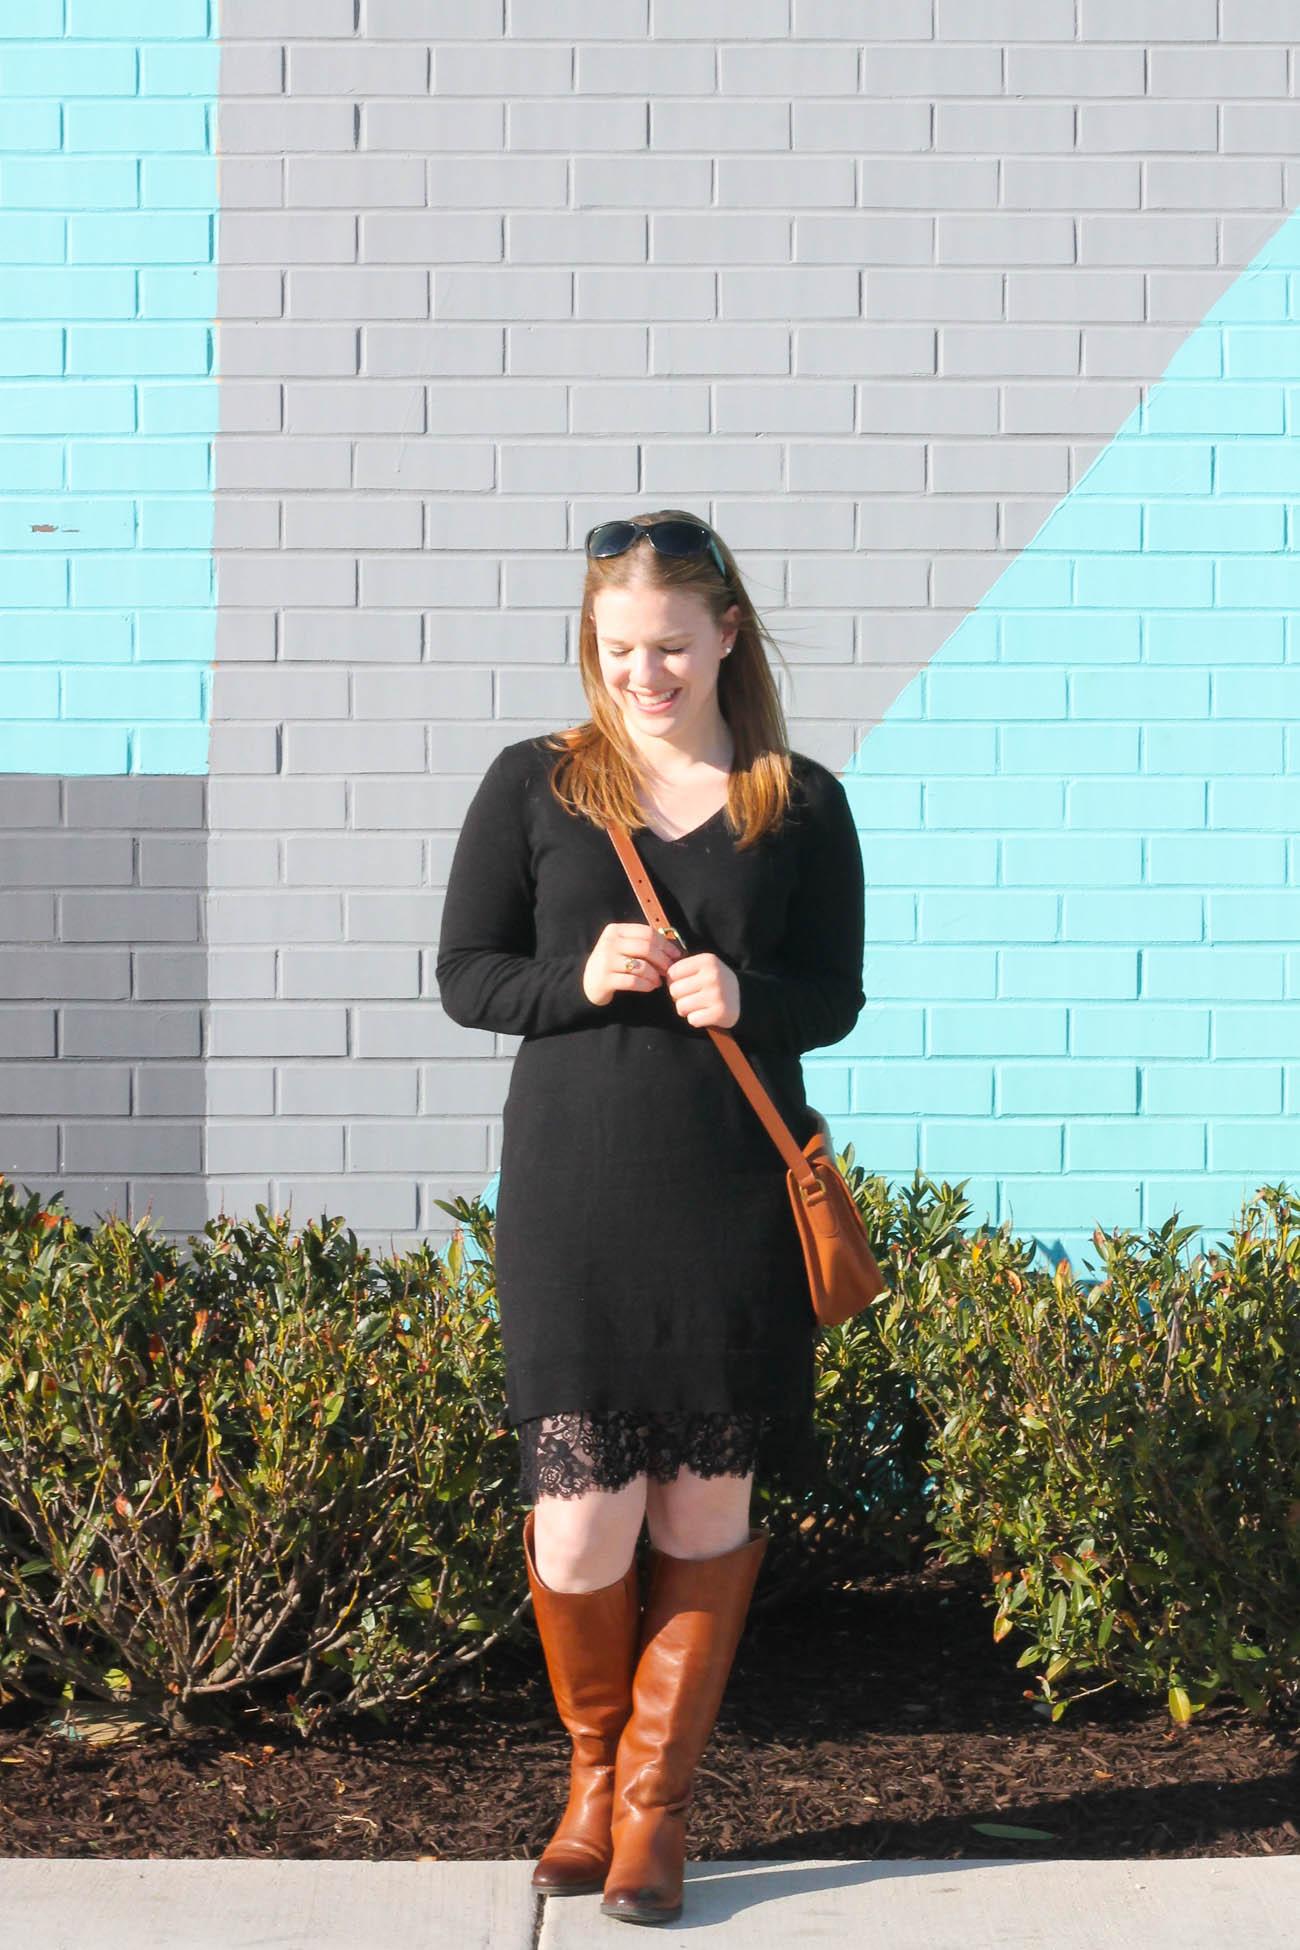 The Sweater Dress | Something Good, @danaerinw